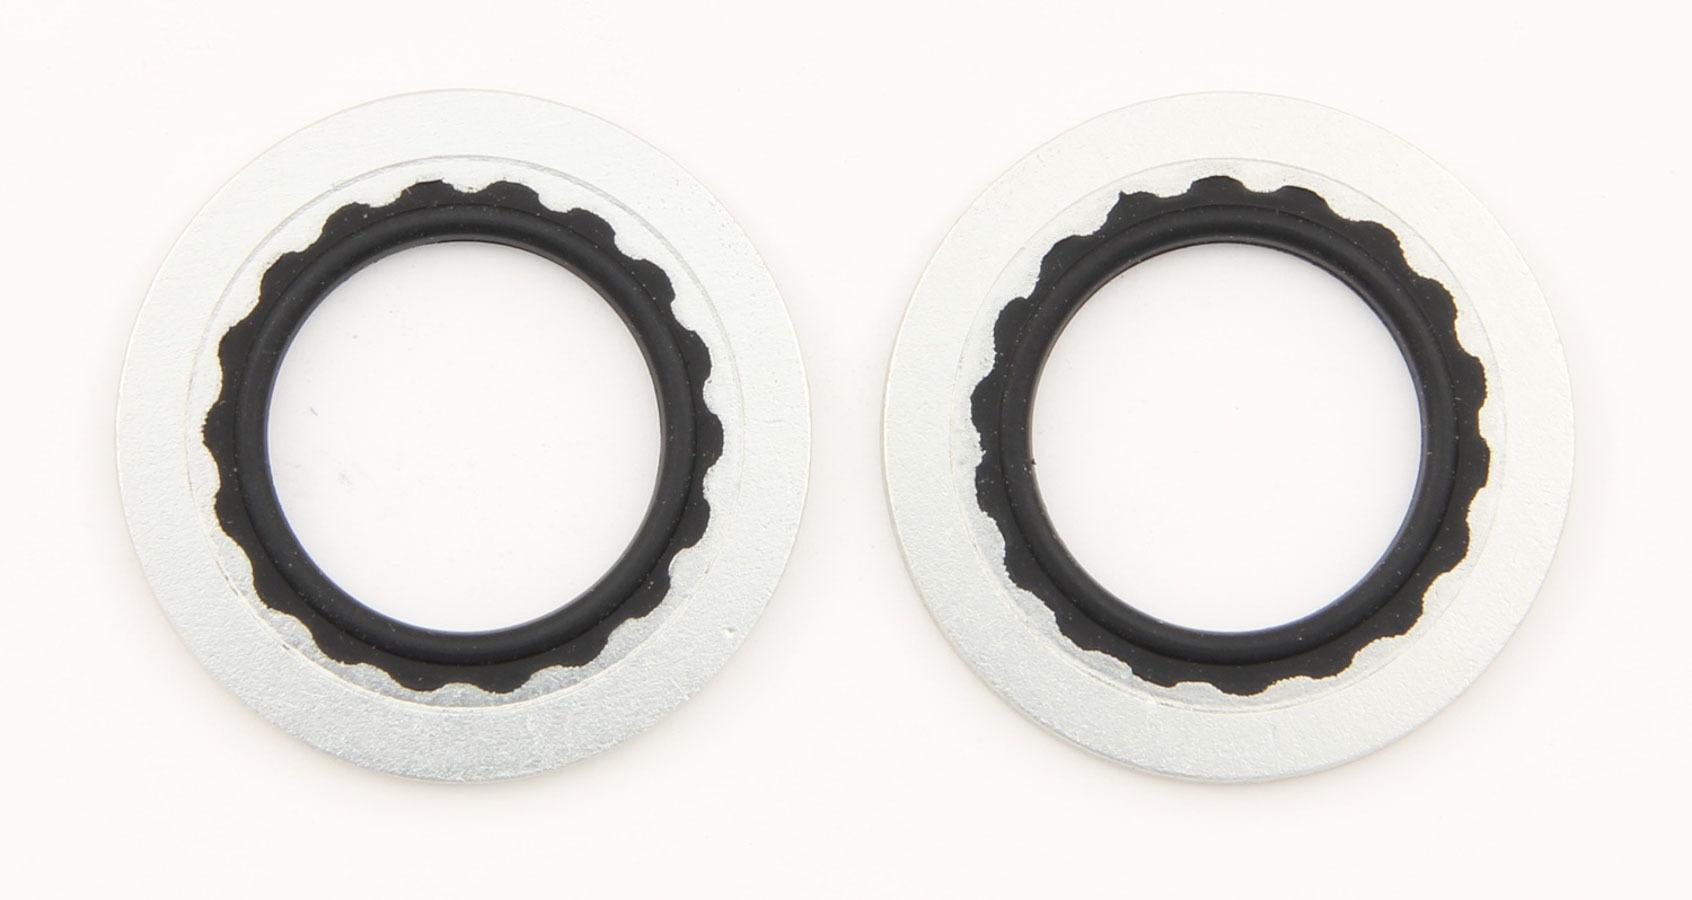 XRP 890216 Sealing Washer, Stat-O-Seal, 1 in ID, Aluminum Washer, Buna N O-Ring, Pair